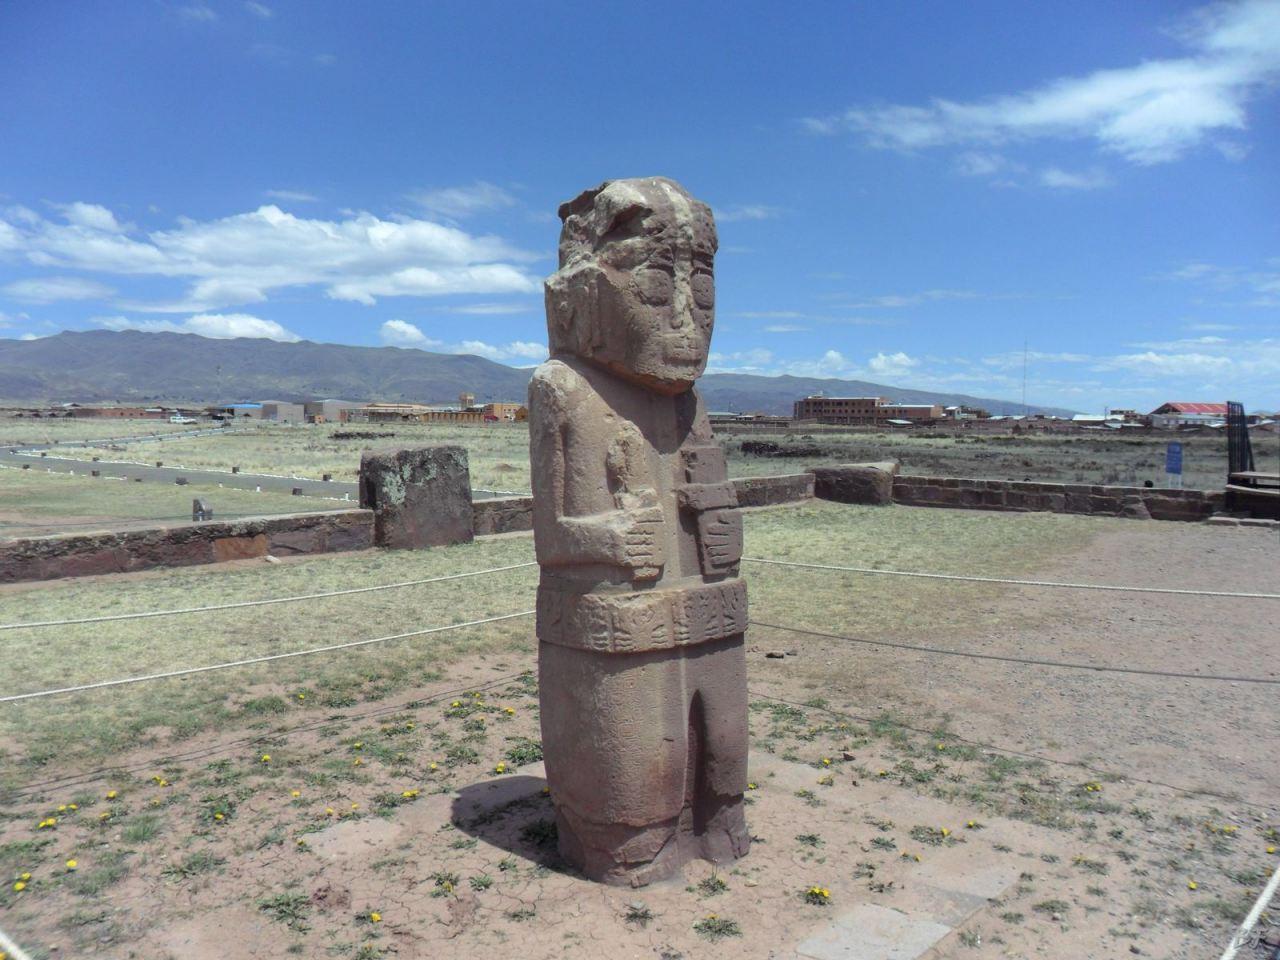 Sito-Megalitico-Piramide-Akapana-Kalasasaya-Menhir-Tiahuanaco-Bolivia-56